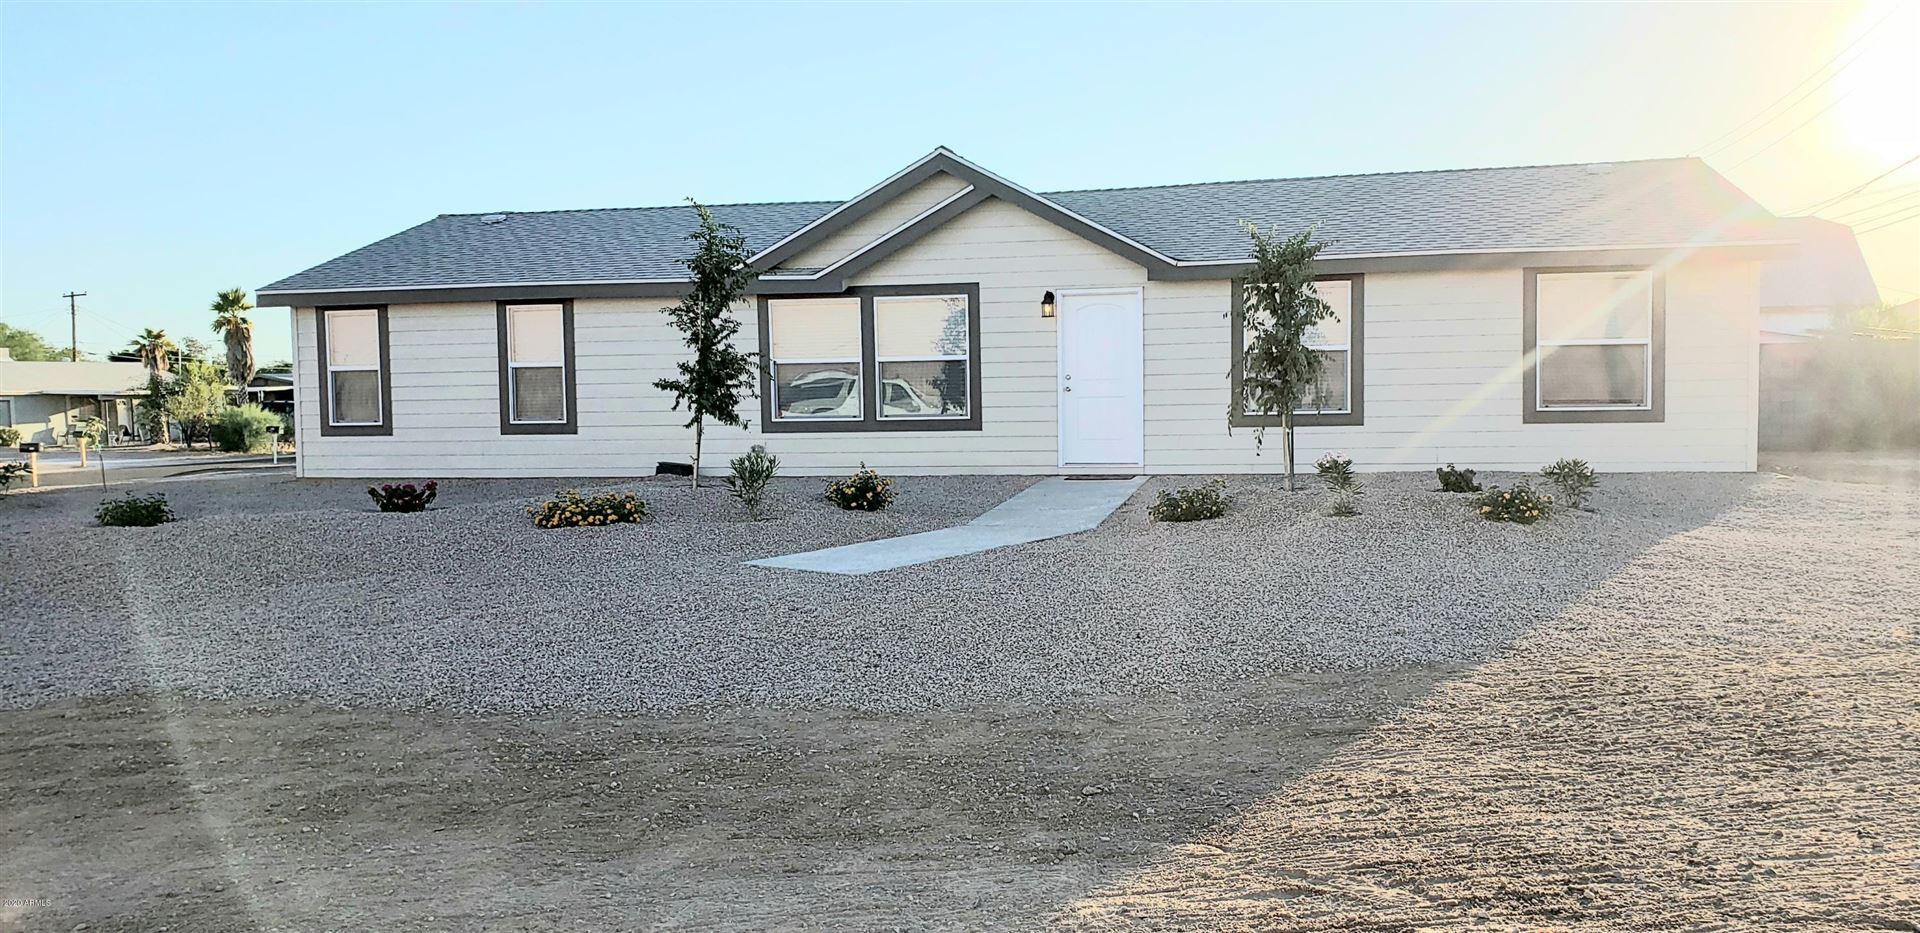 8732 E Edgewood Avenue, Mesa, AZ 85208 - #: 6097398